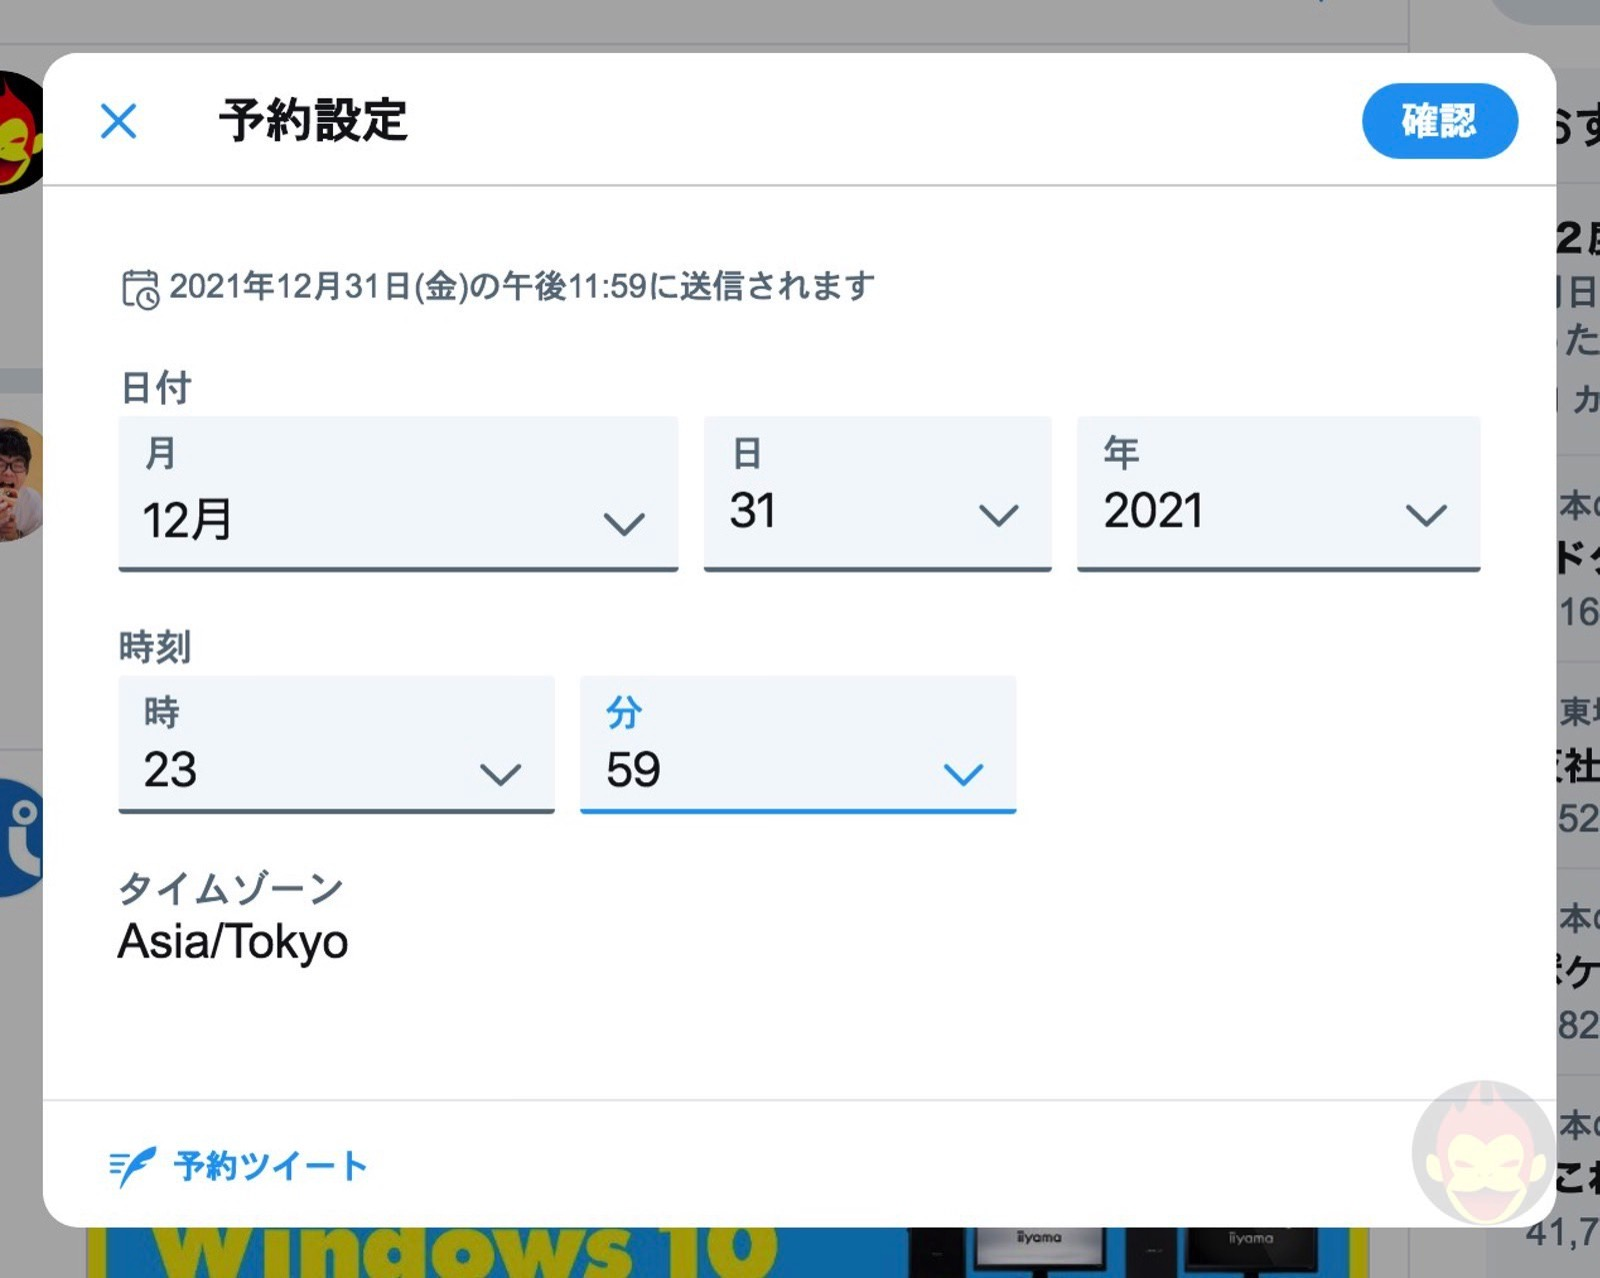 Twitter schedule tweet feature in testing 200